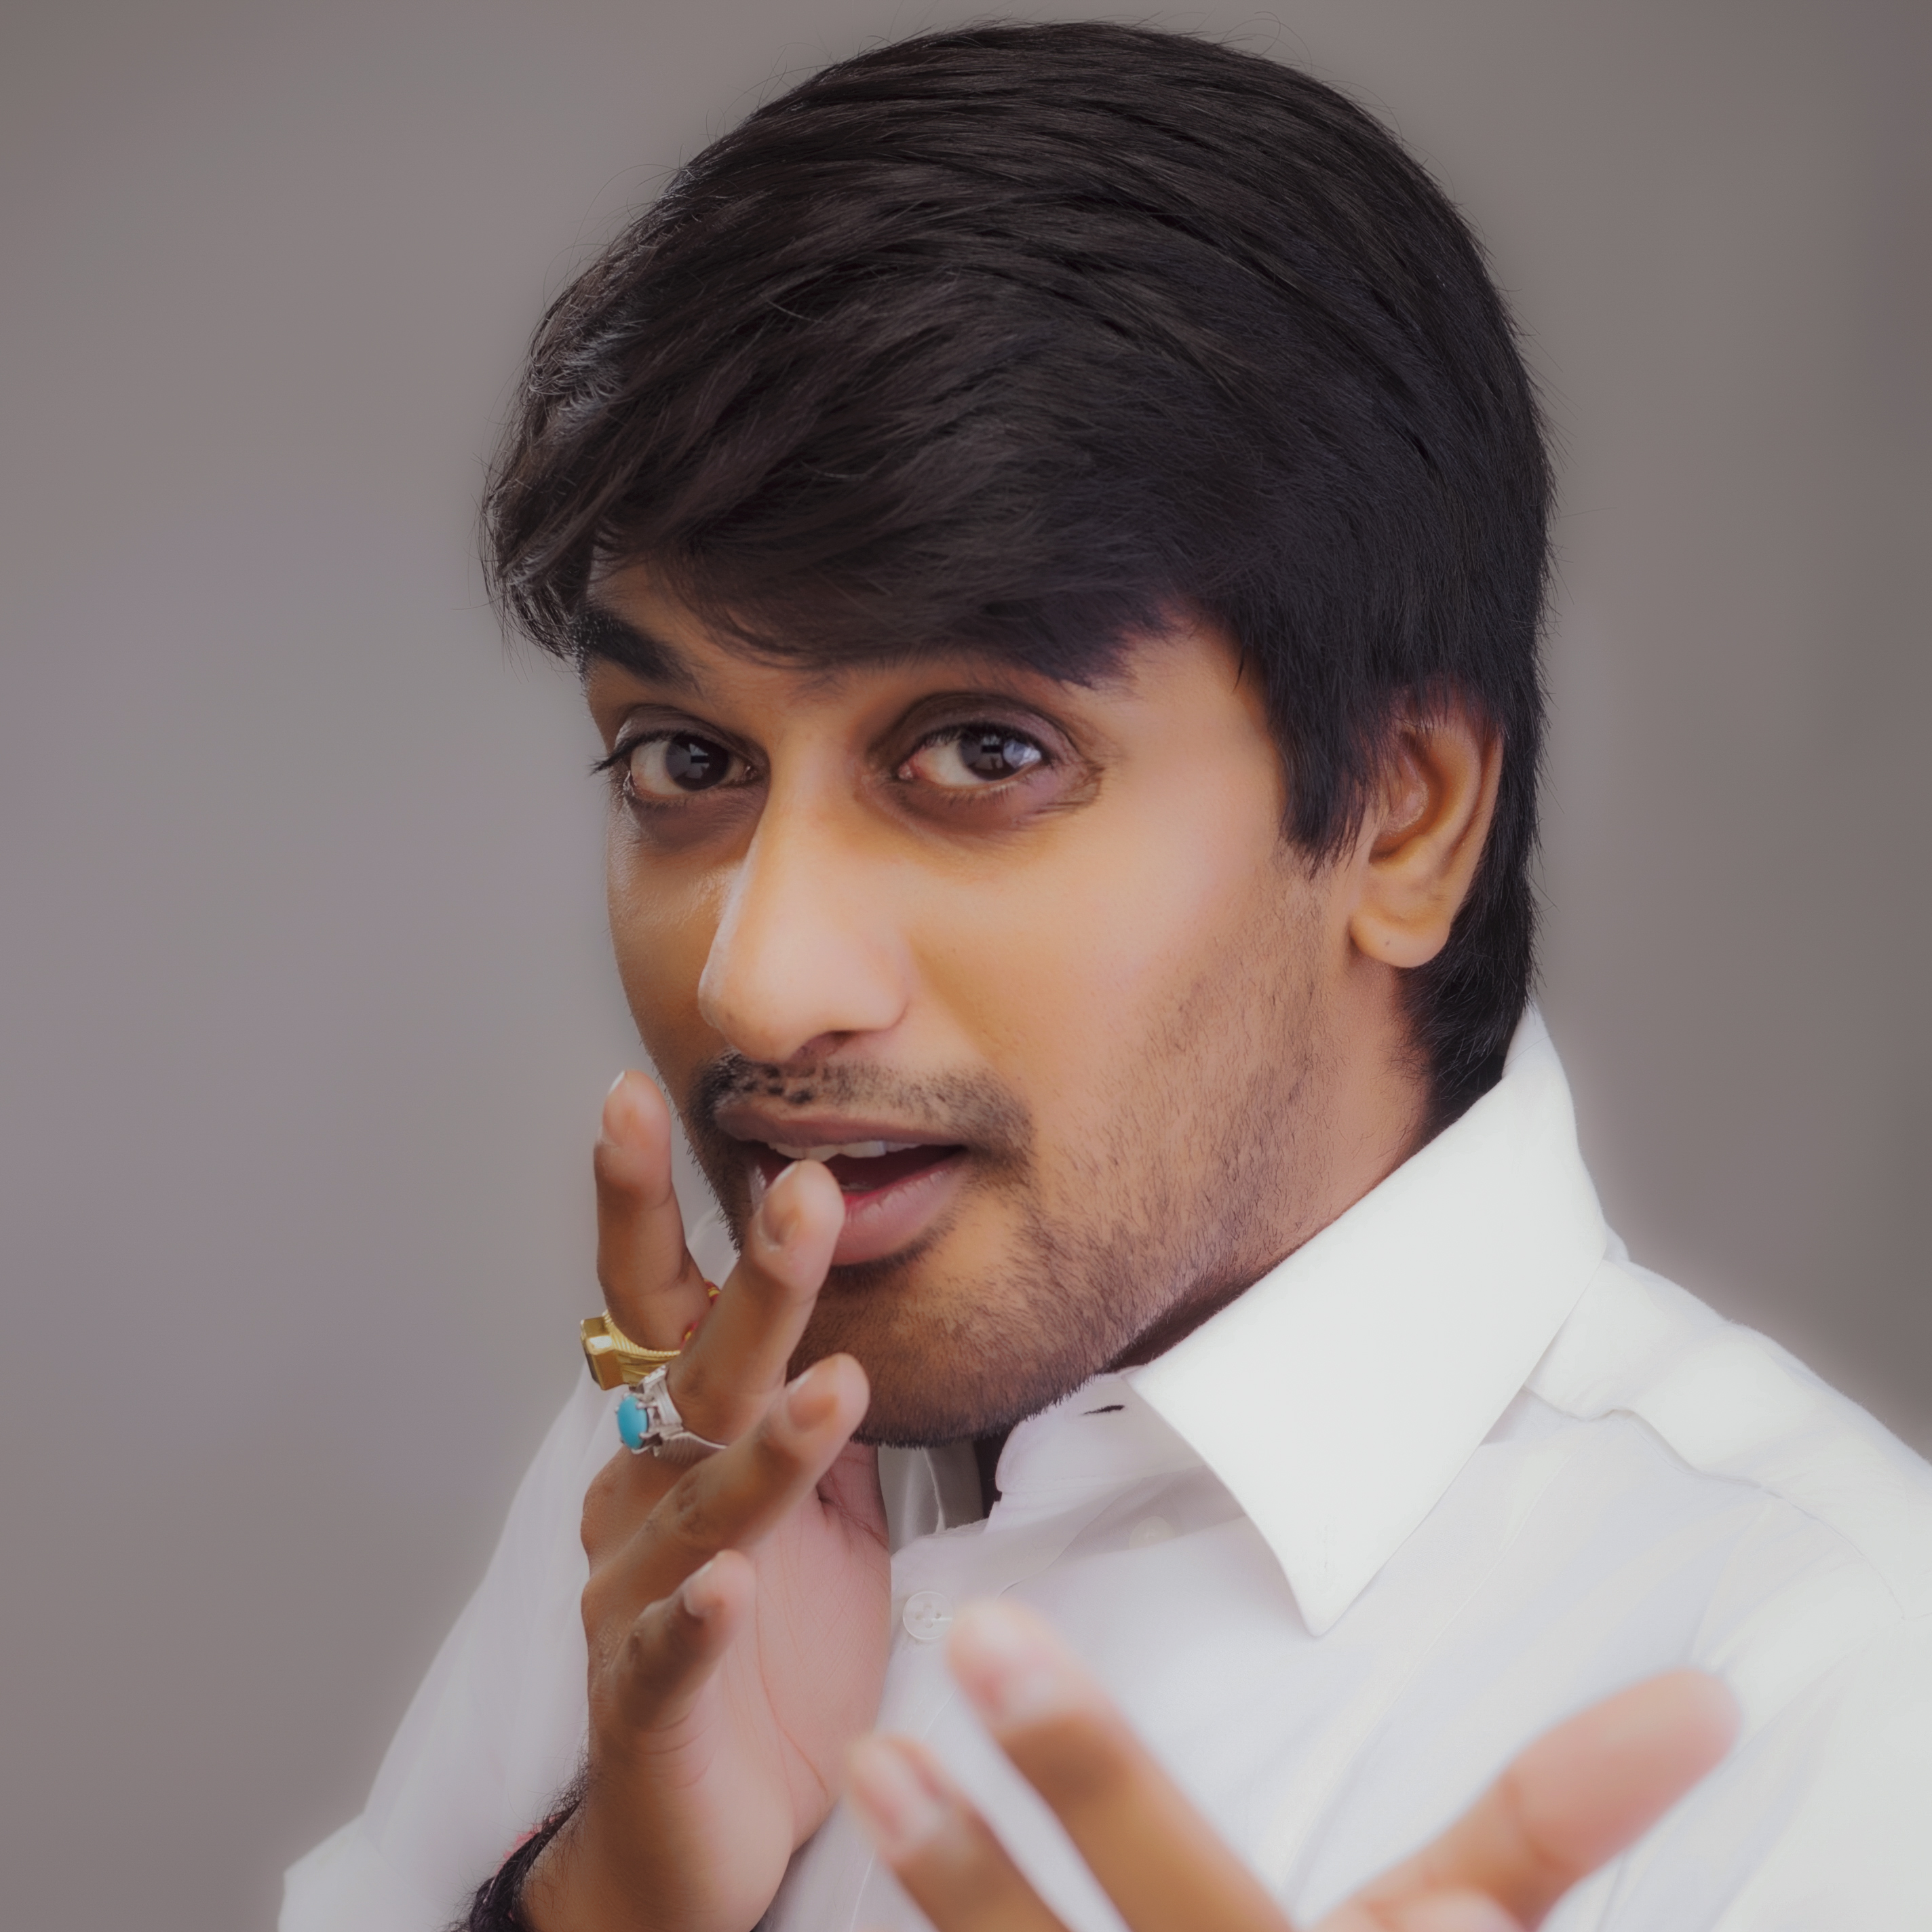 I am Dhruv H. Panchal